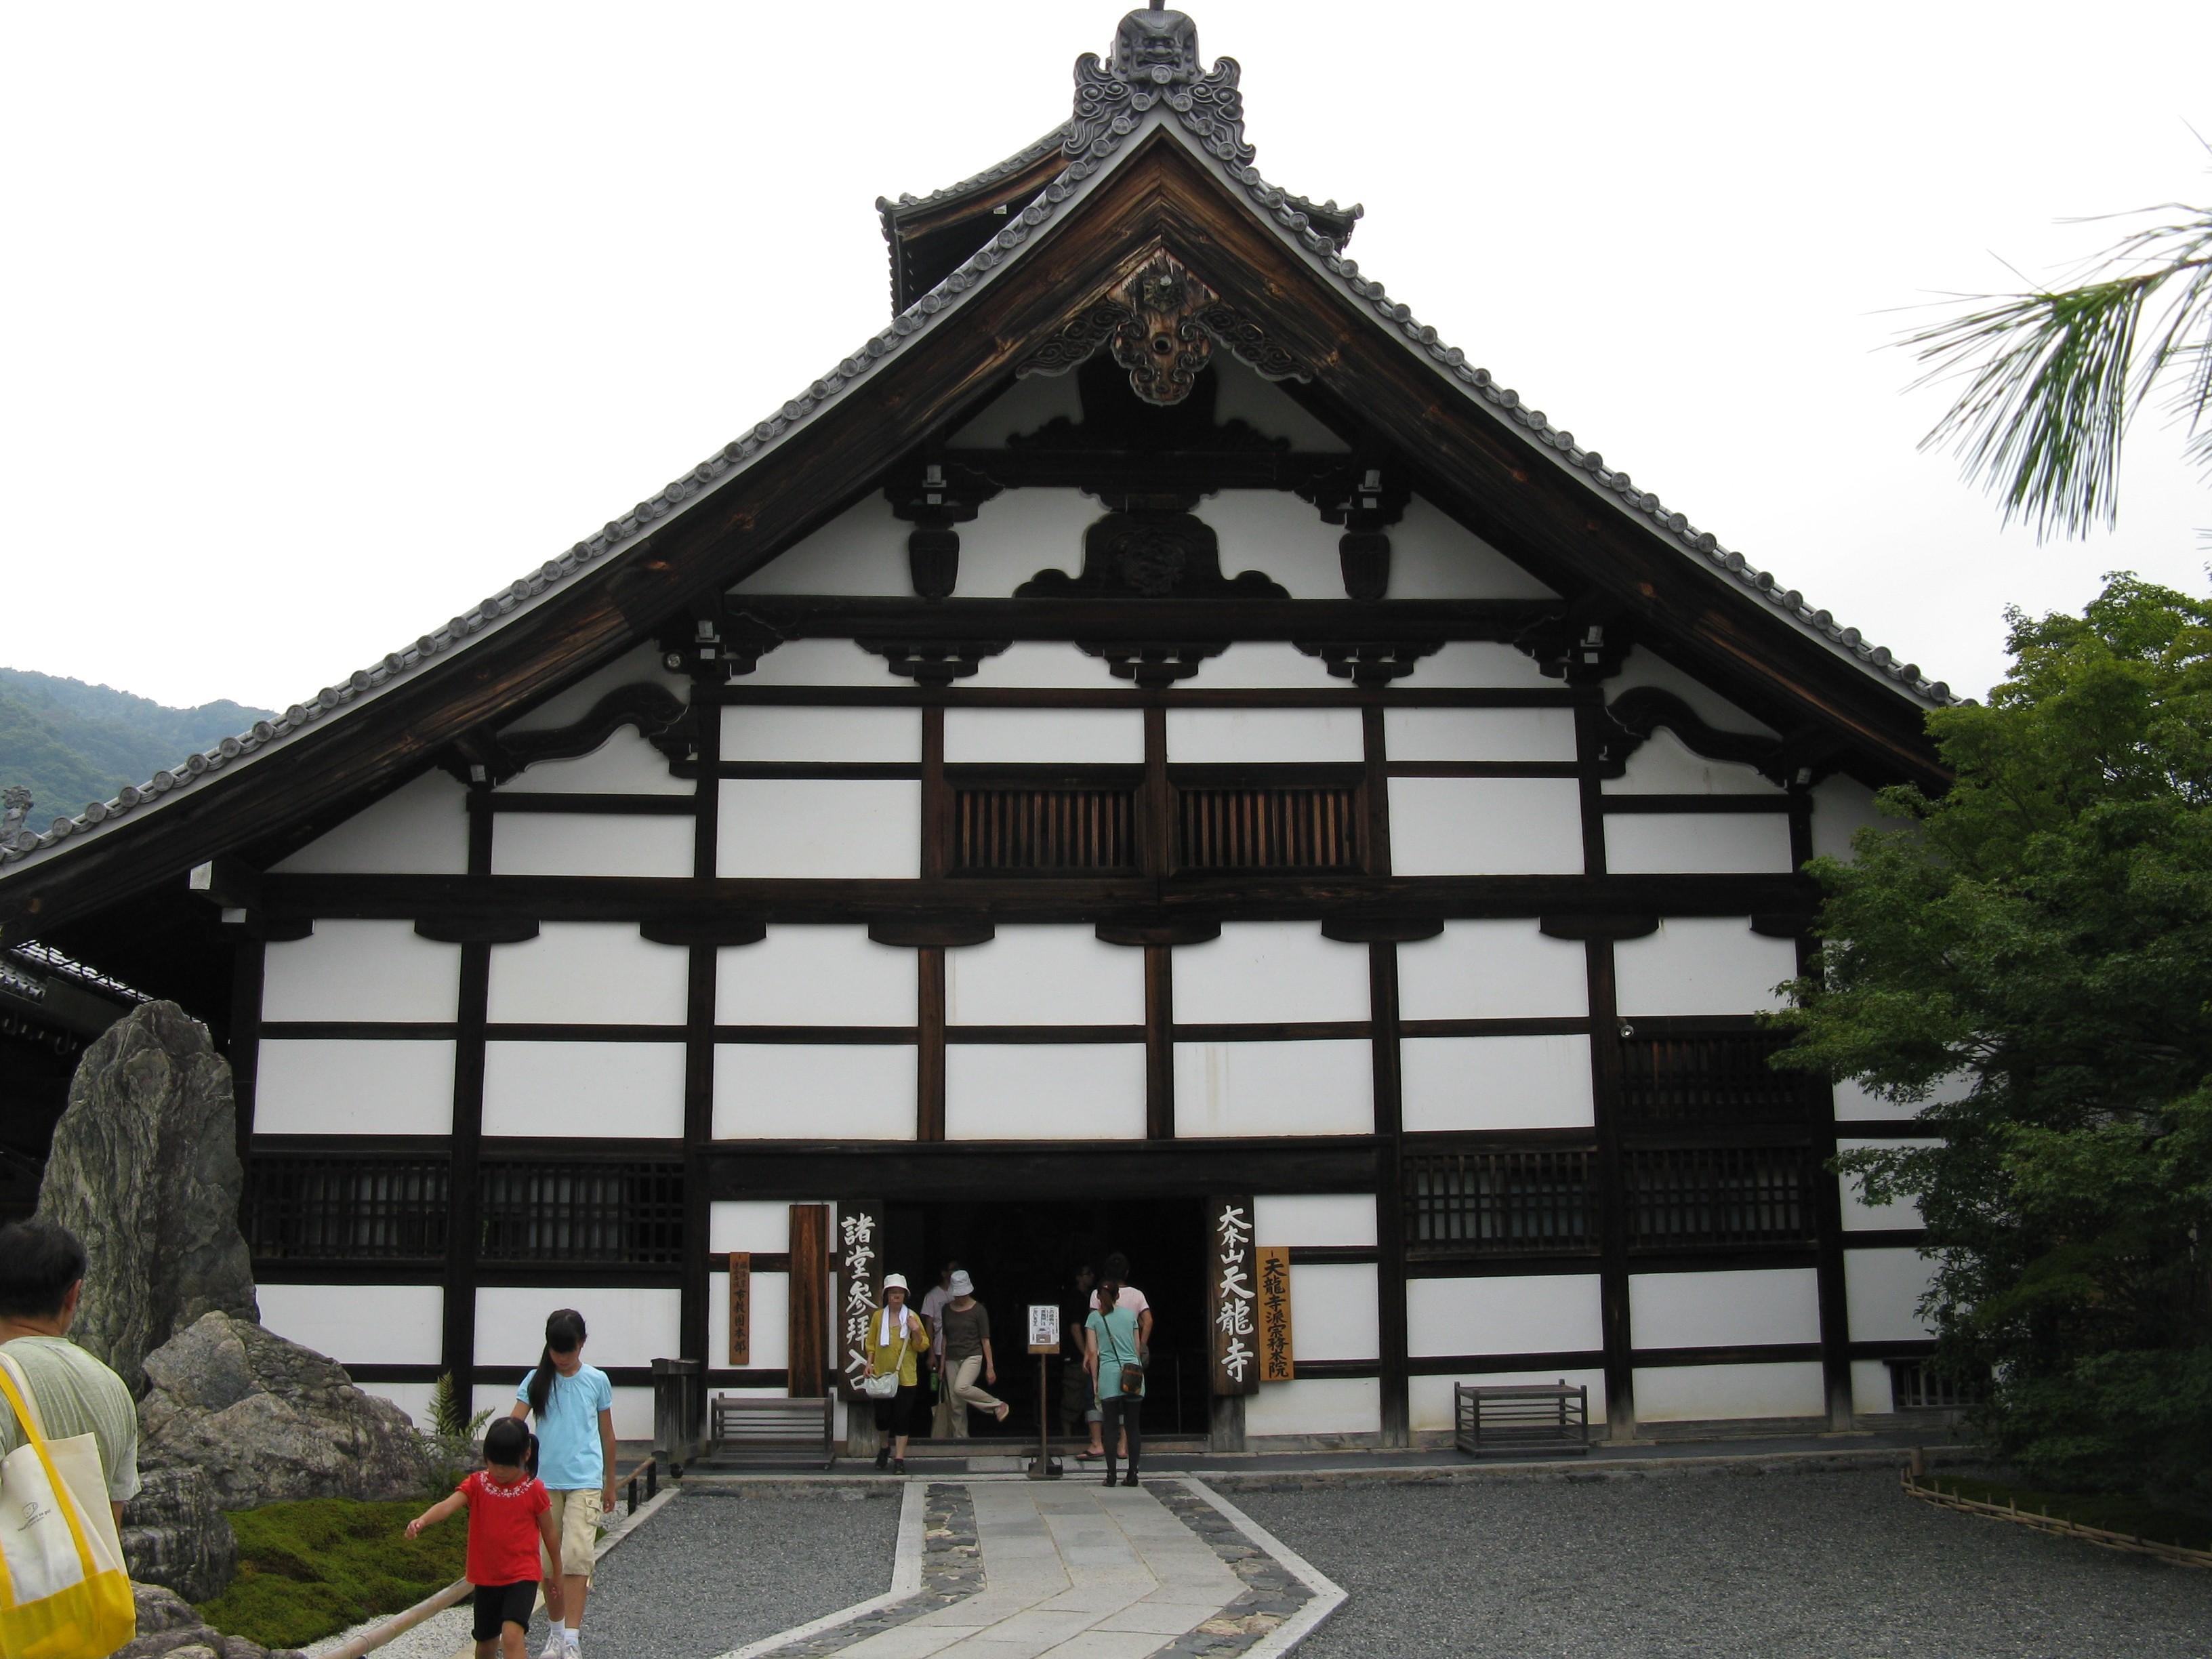 Tenryuji Zen Temple